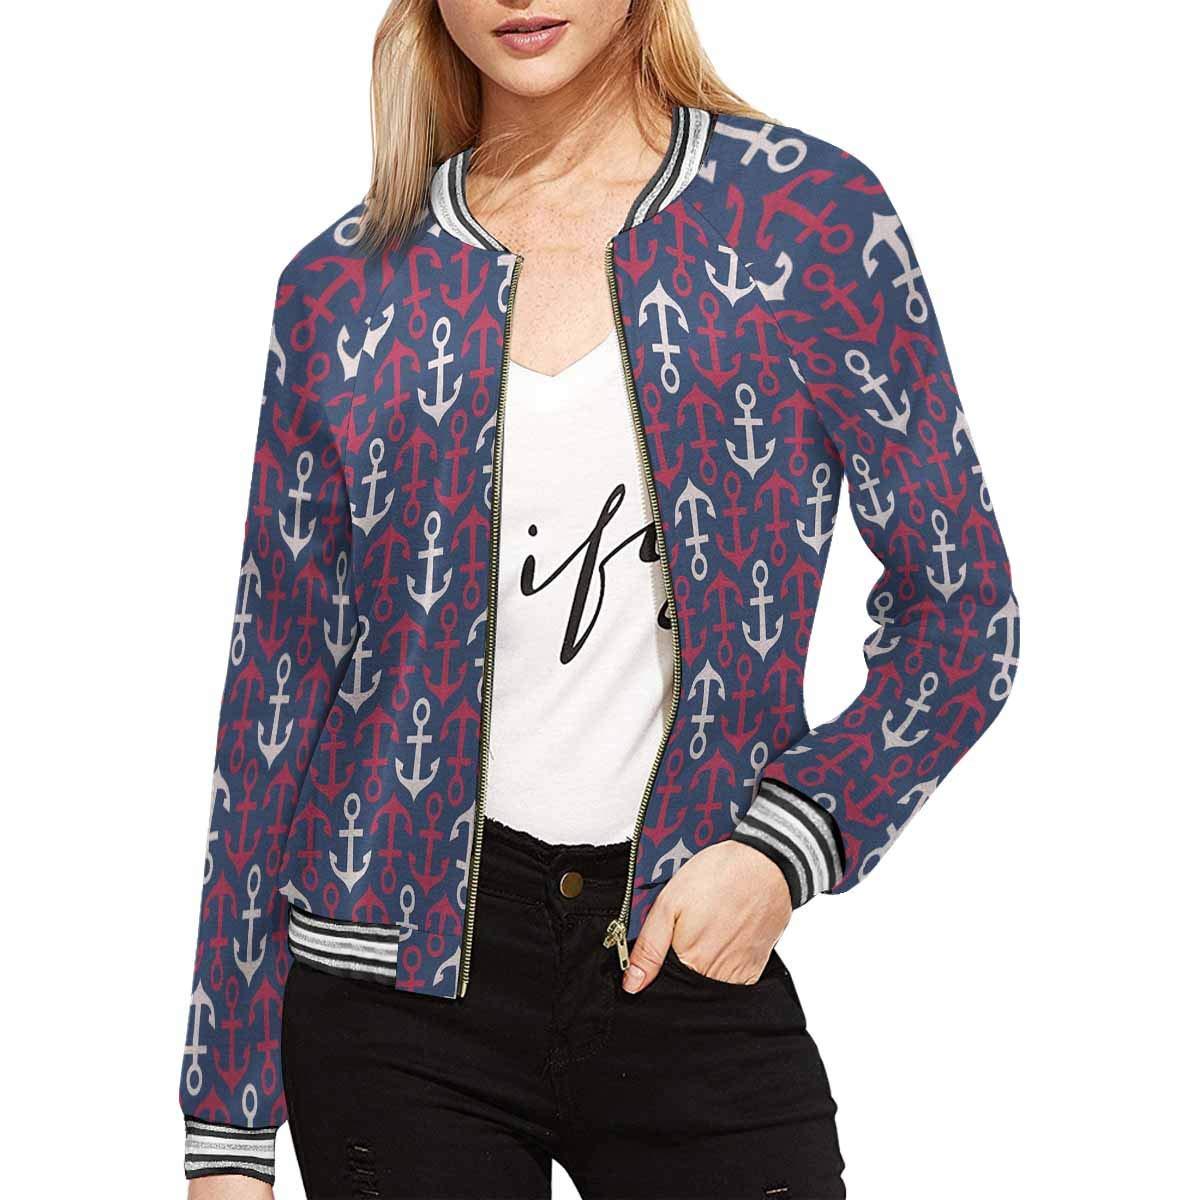 INTERESTPRINT Womens Stylish Anchor Blue Red White Jacket Coat